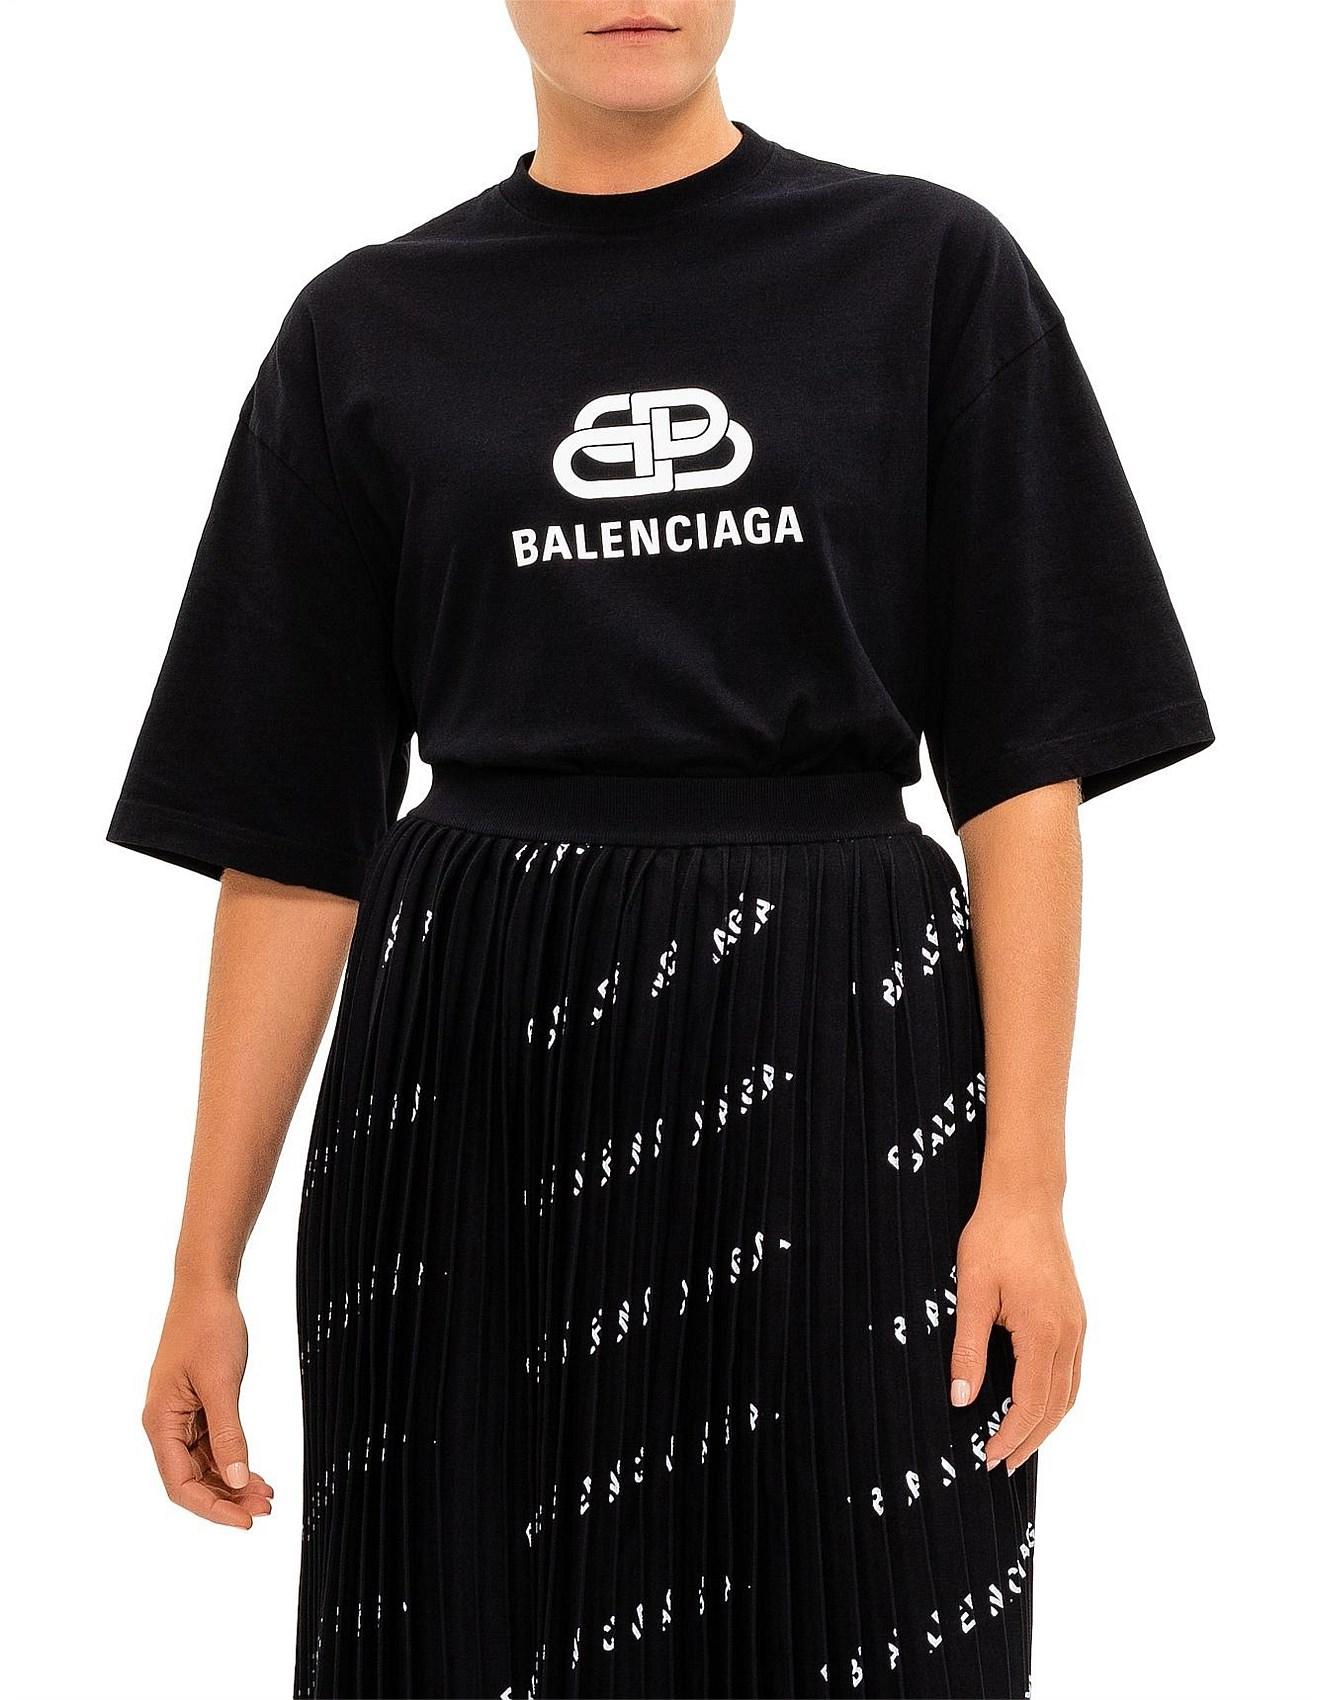 68284f571ff BB Balenciaga New Logo Oversized Tshirt Co